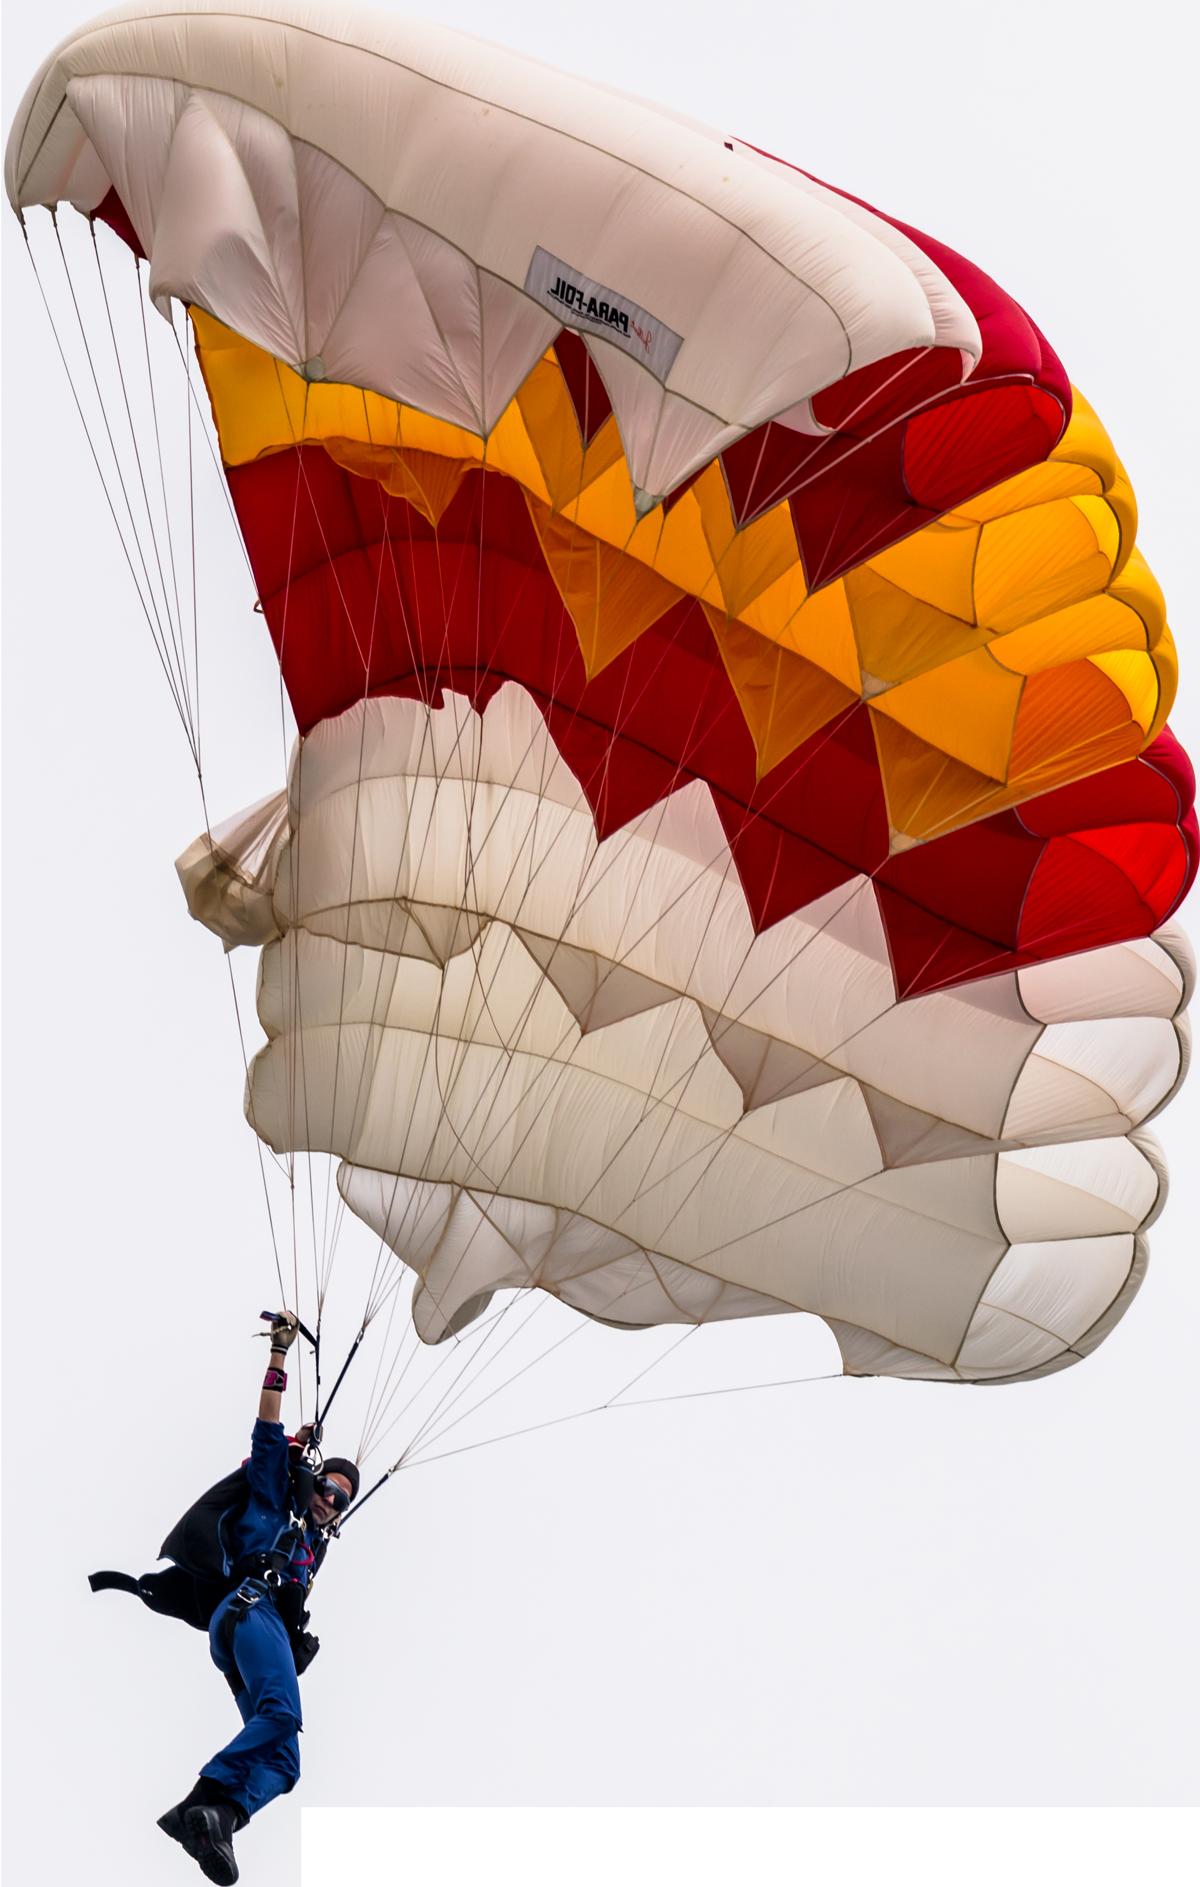 skydiverleft